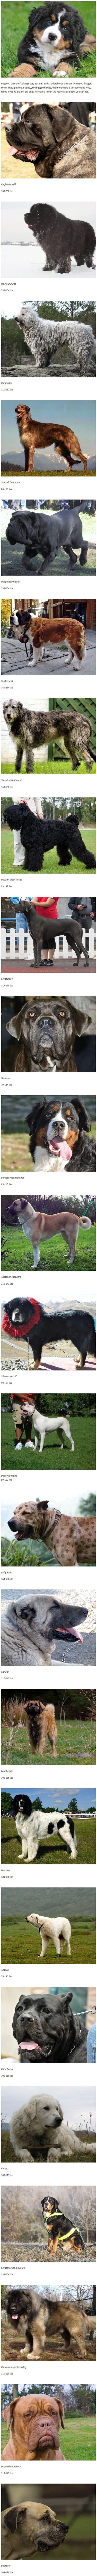 Massive dog breeds